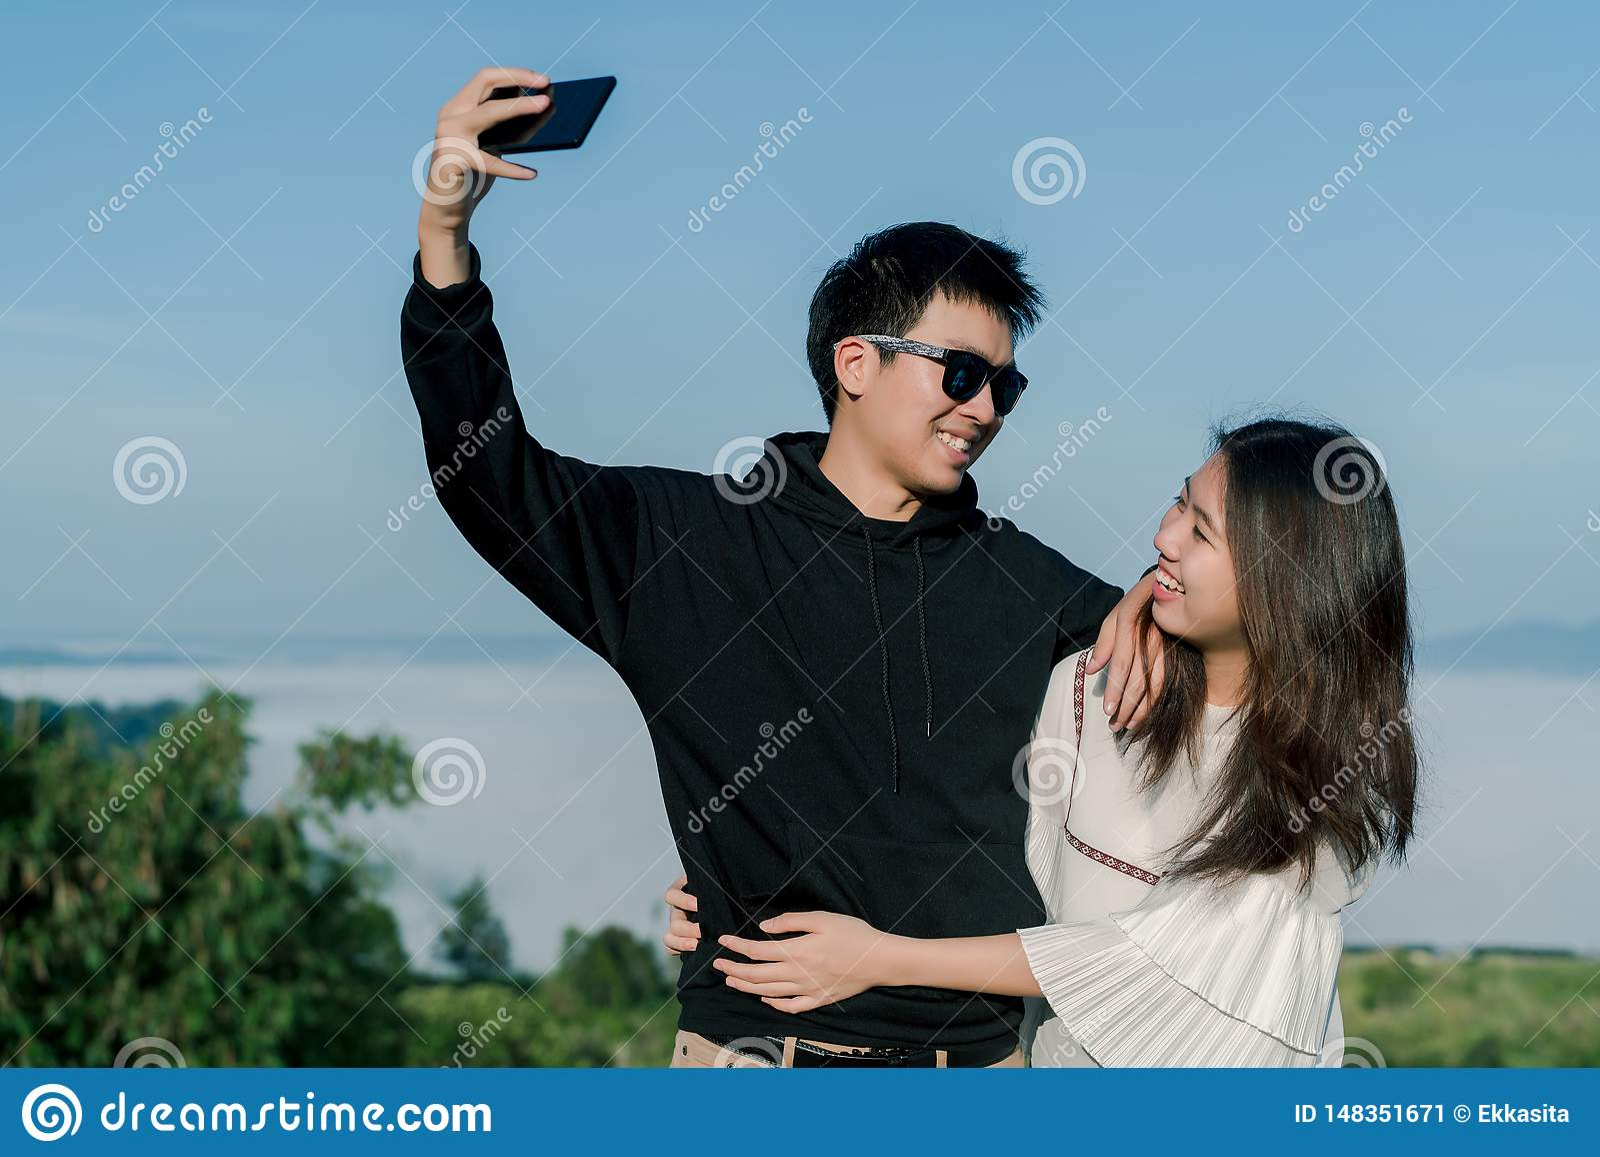 dating an adventurous guy